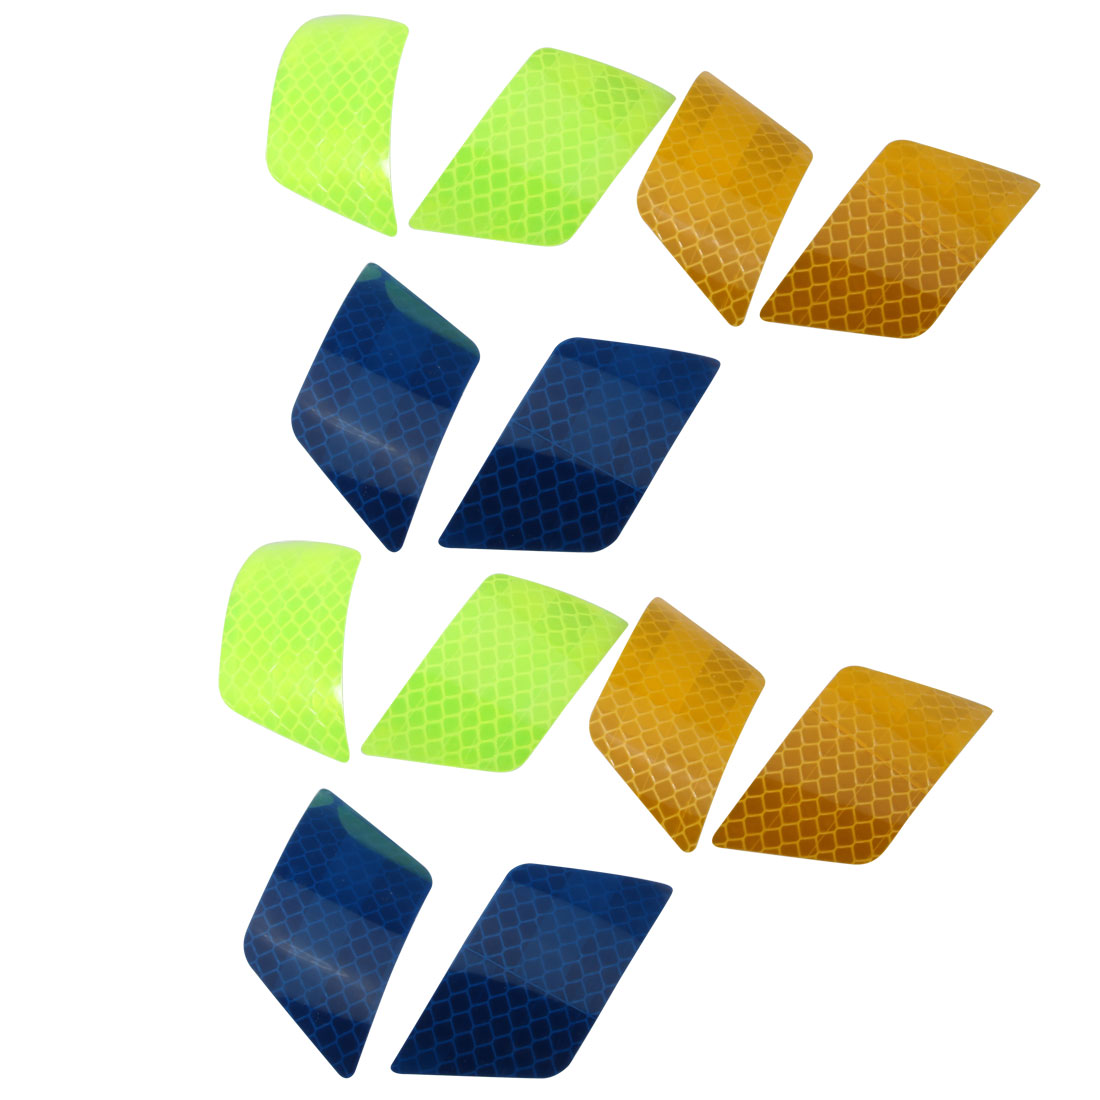 6Pair Reflective Warning Tape Strip Sticker Green Blue Orange 30mmx70mm for Car